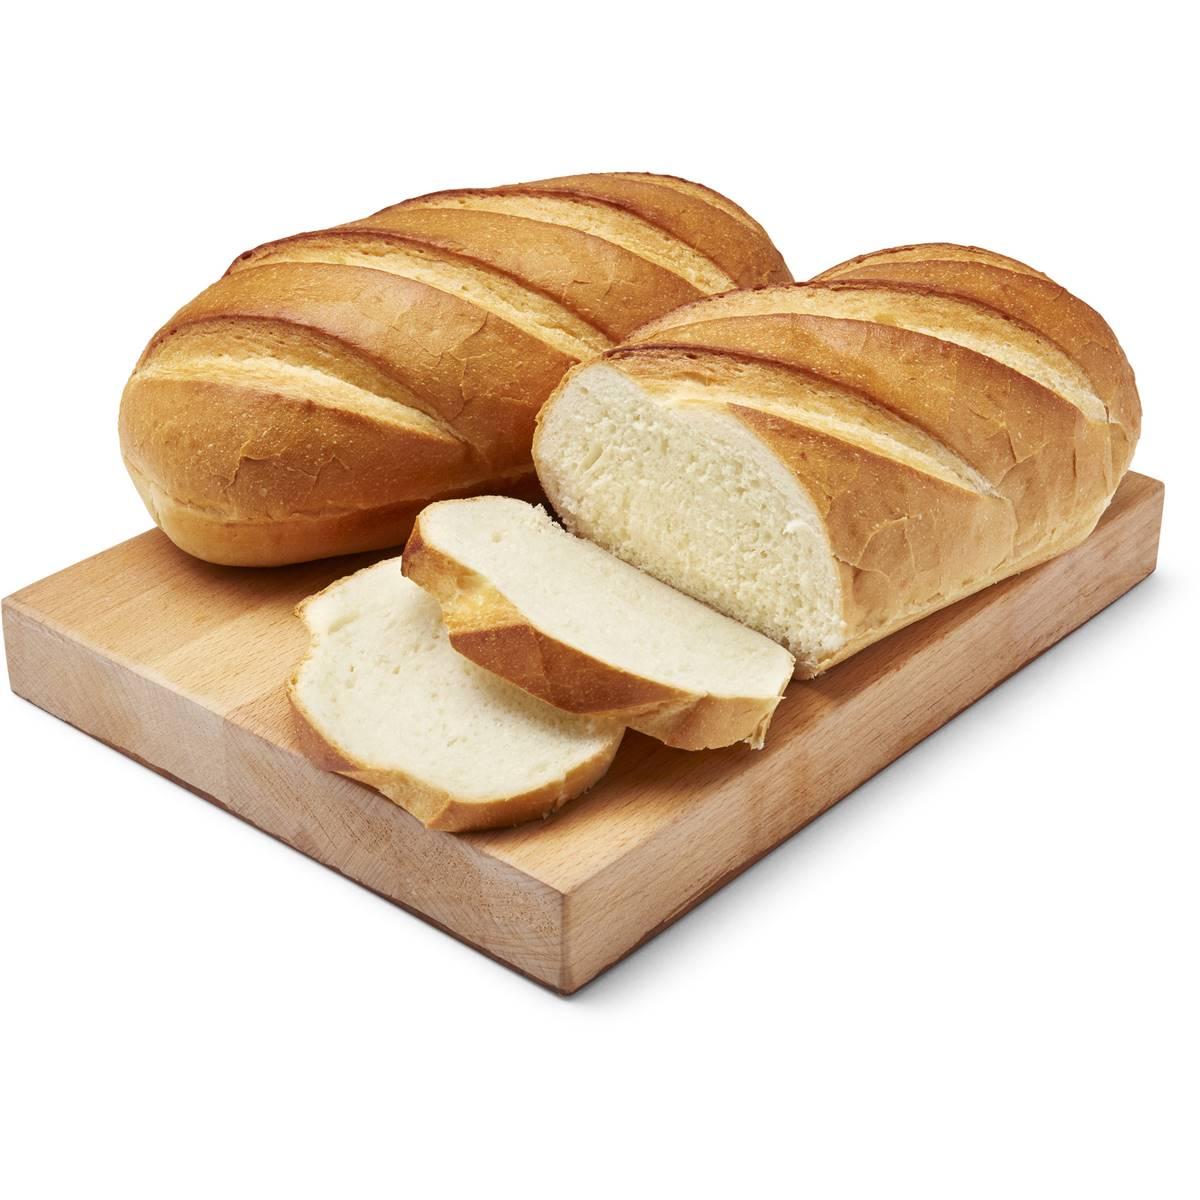 bread making level 2 vienna bread